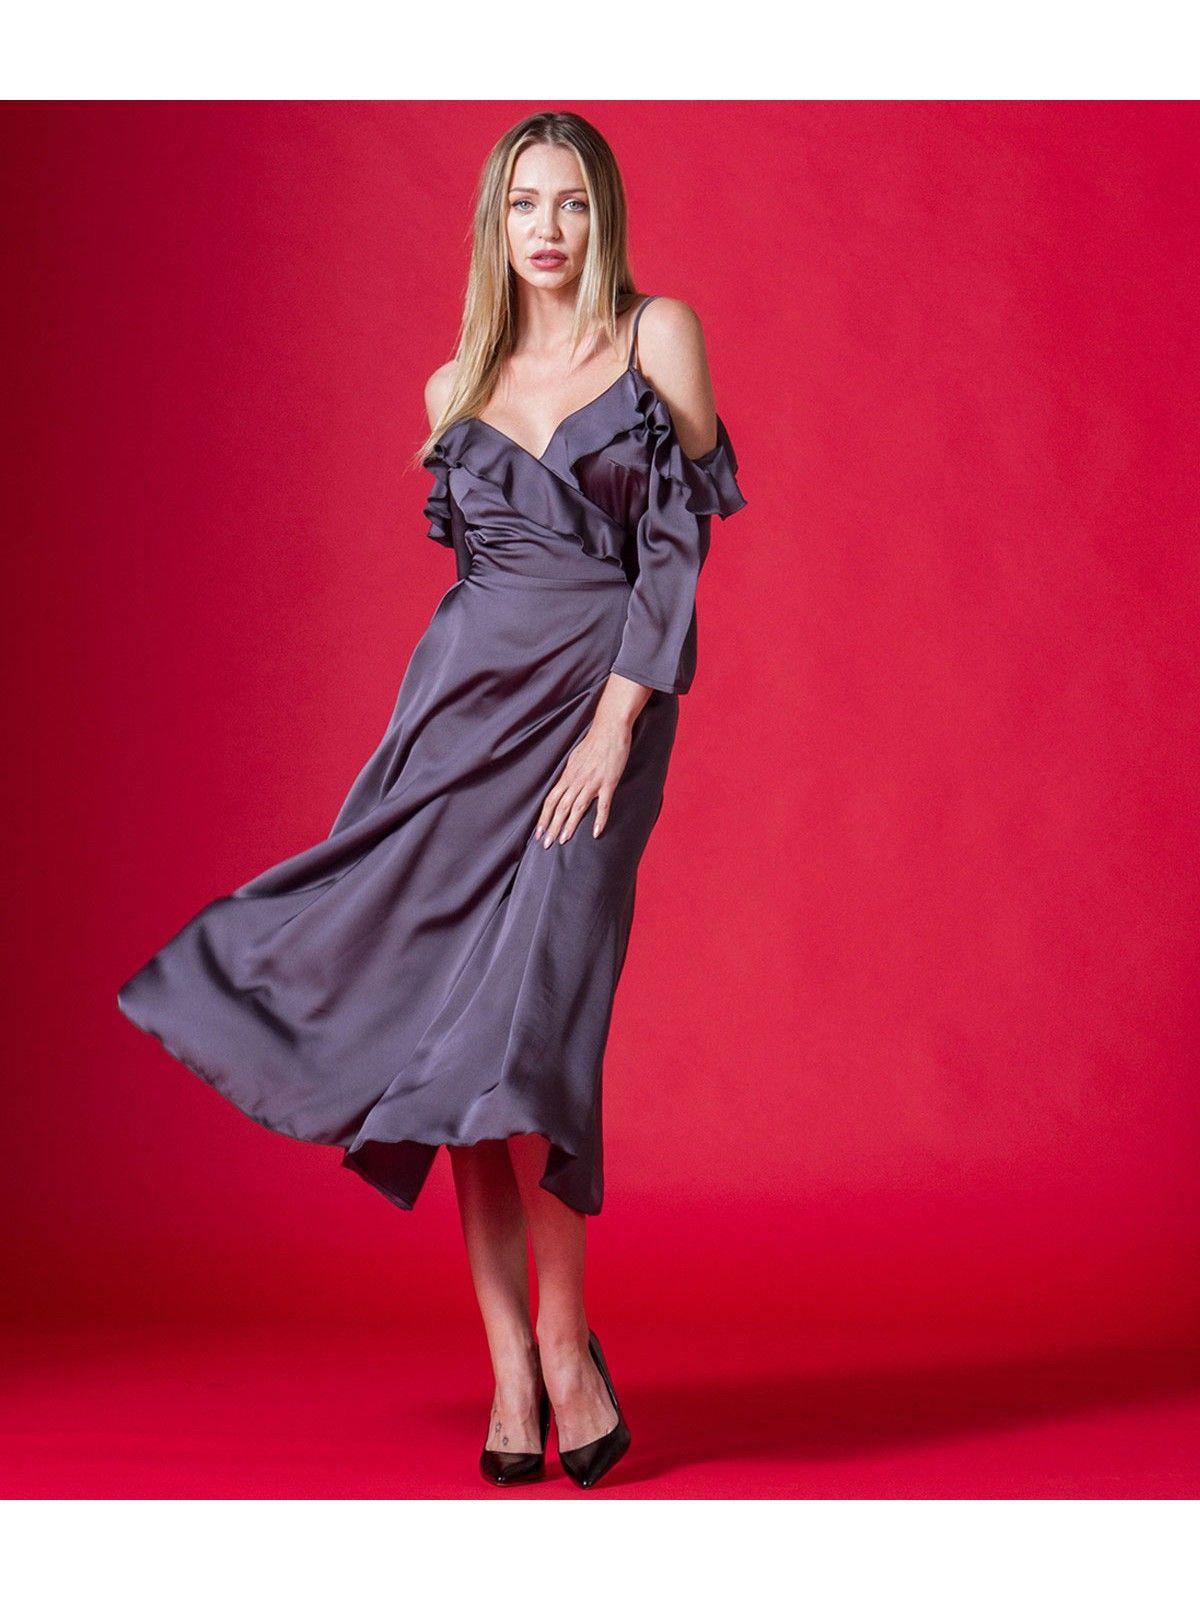 fadfa8819b70 Φόρεμα Midi Κρουαζέ Έξωμο με Βολάν Ραντάκι και Μανίκια - Γκρι-Ανθρακί